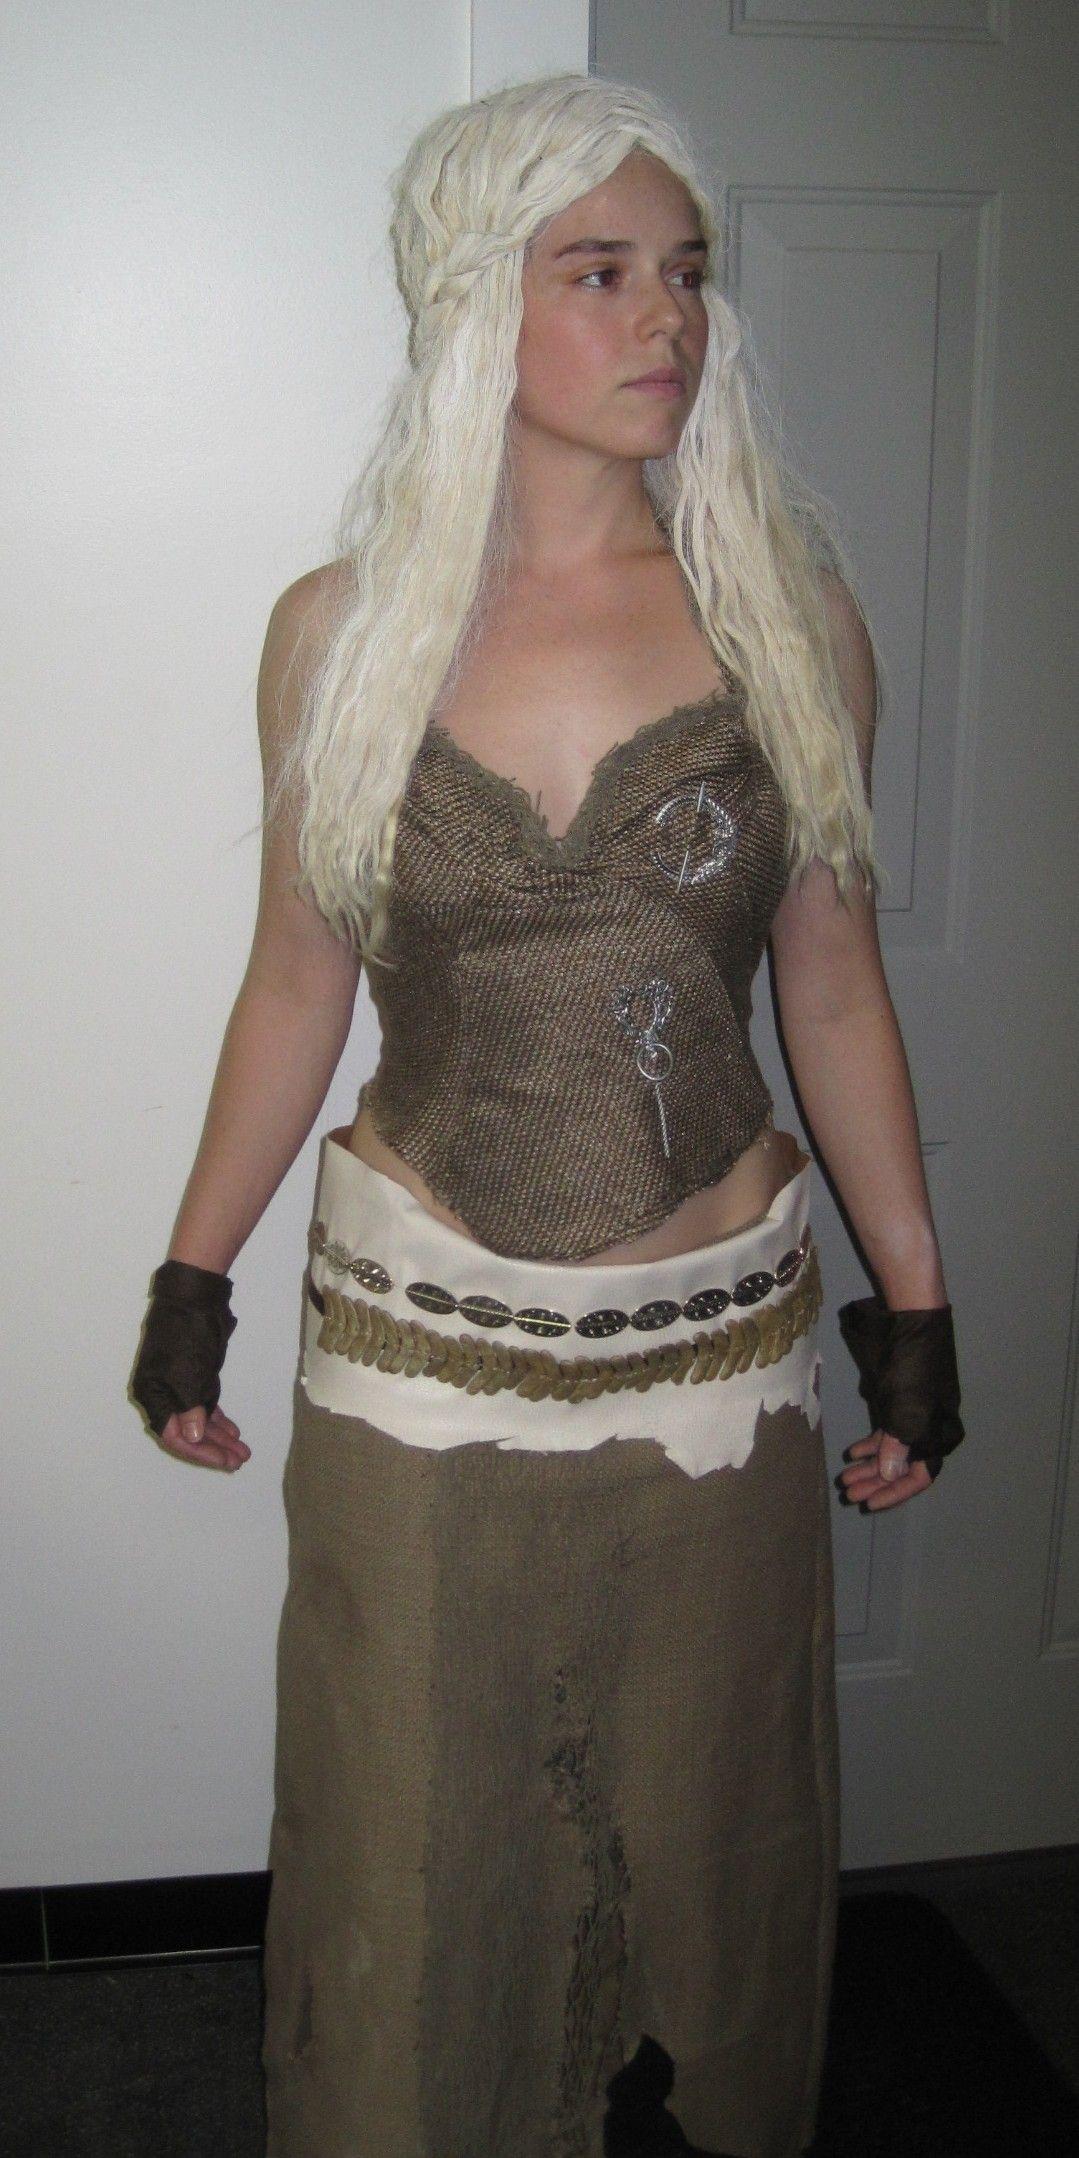 how to make daenerys belt costume - Google Search  sc 1 st  Pinterest & how to make daenerys belt costume - Google Search | Costume ...